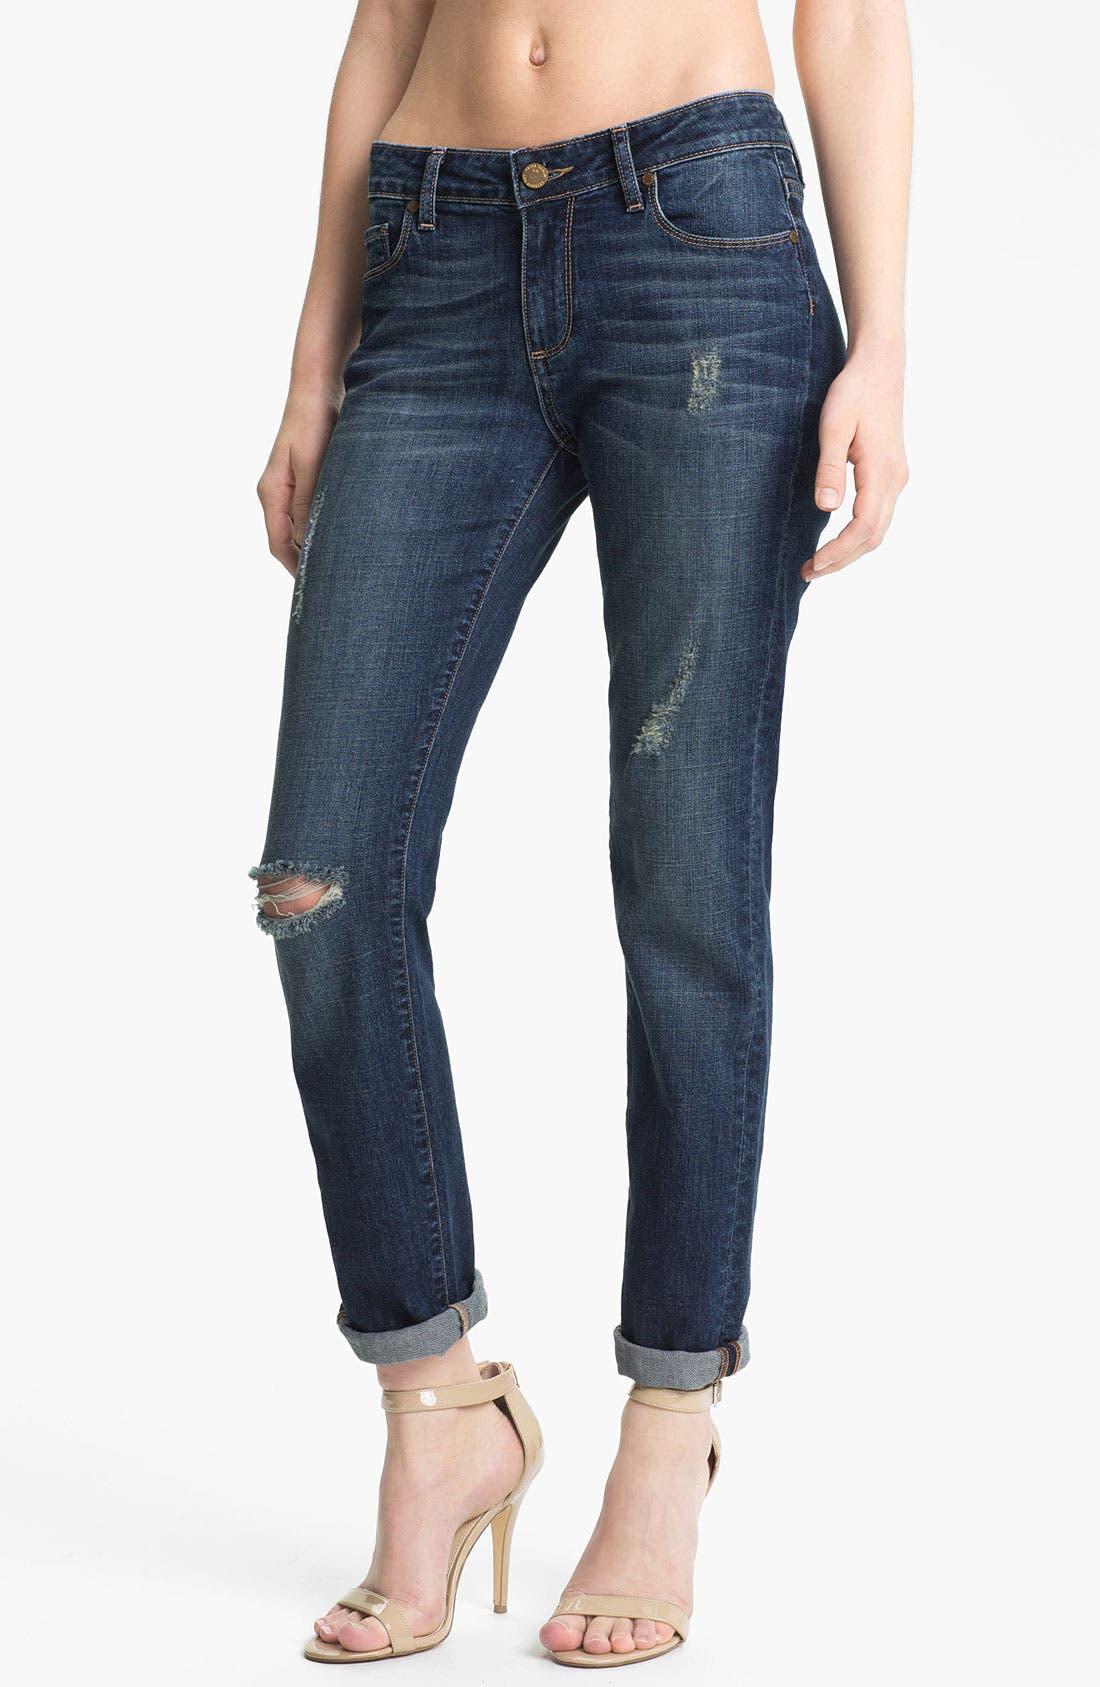 Alternate Image 1 Selected - Paige Denim 'Jimmy Jimmy' Distressed Boyfriend Jeans (Tawni Destruction)